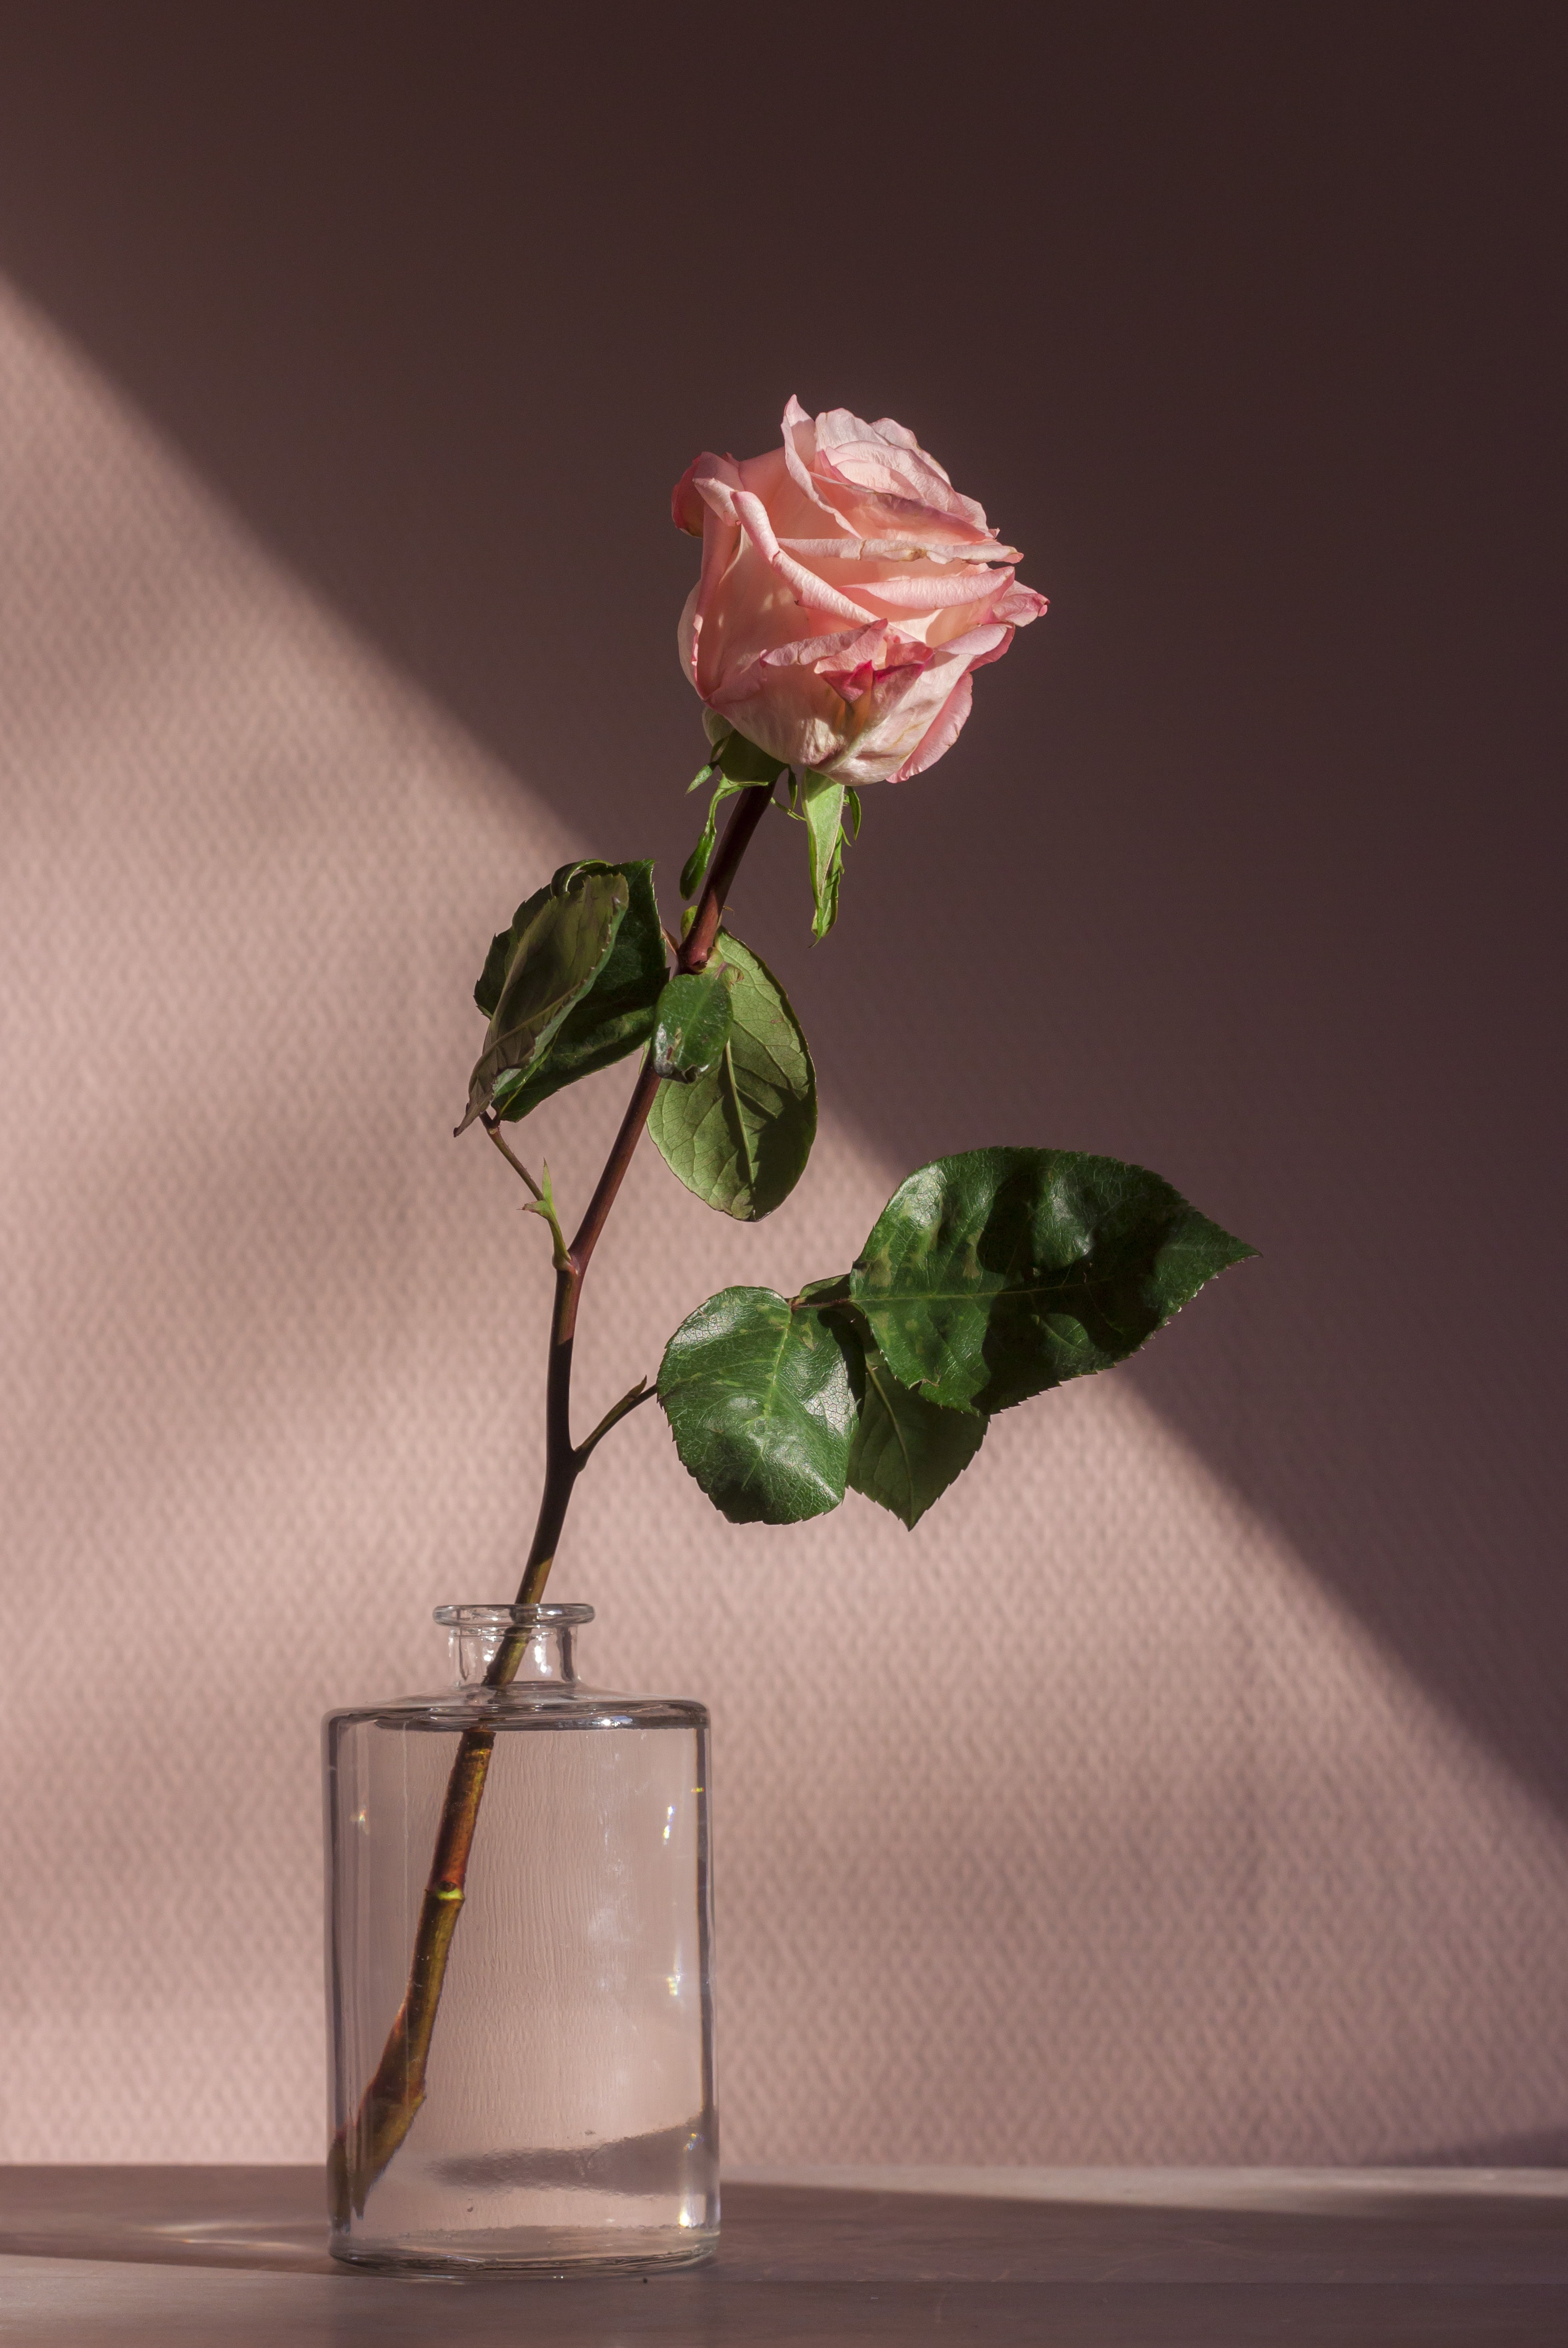 Baby Pink Aesthetic Rose 3019651 Hd Wallpaper Backgrounds Download Aesthetic rose roses floweraesthetic animeaesthetic redaesthetic medibangpaintpro f2u flower. baby pink aesthetic rose 3019651